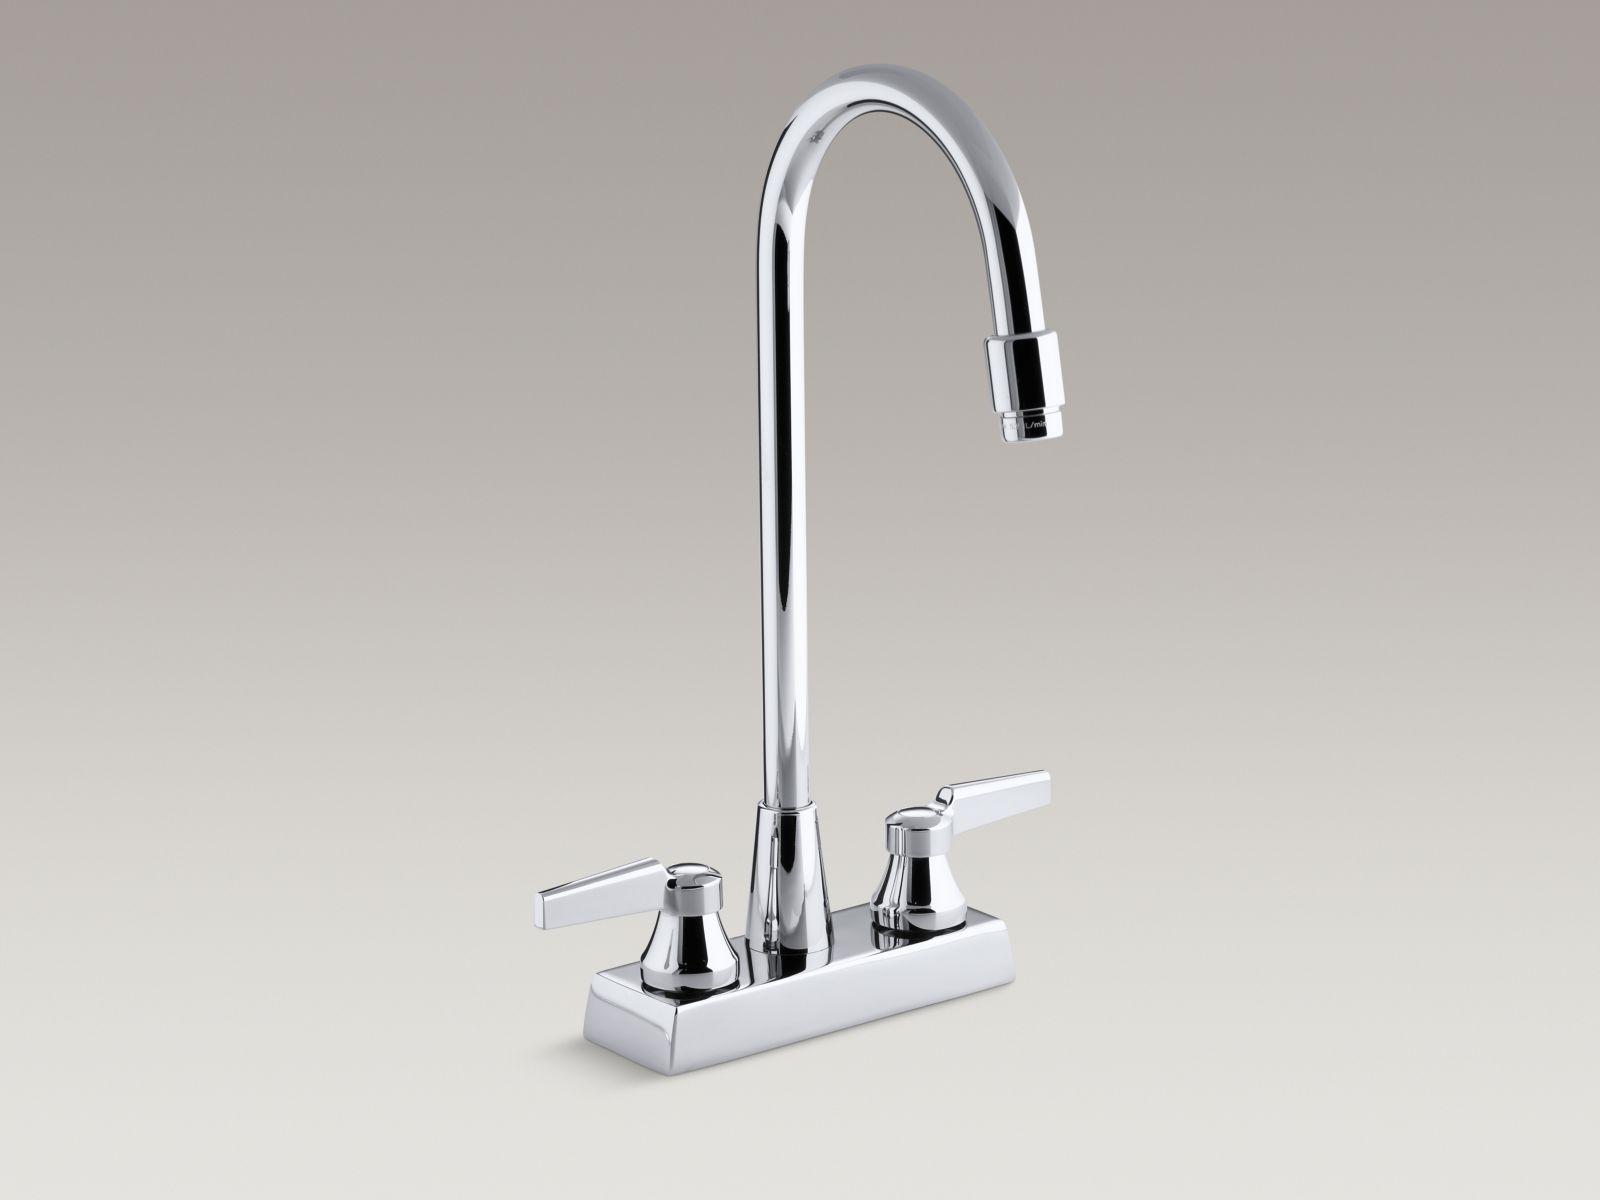 Kohler K-7305-KE-CP Triton Centerset Handle-less Commercial Bathroom Faucet with Vandal-resistant Aerated Gooseneck Spout Polished Chrome